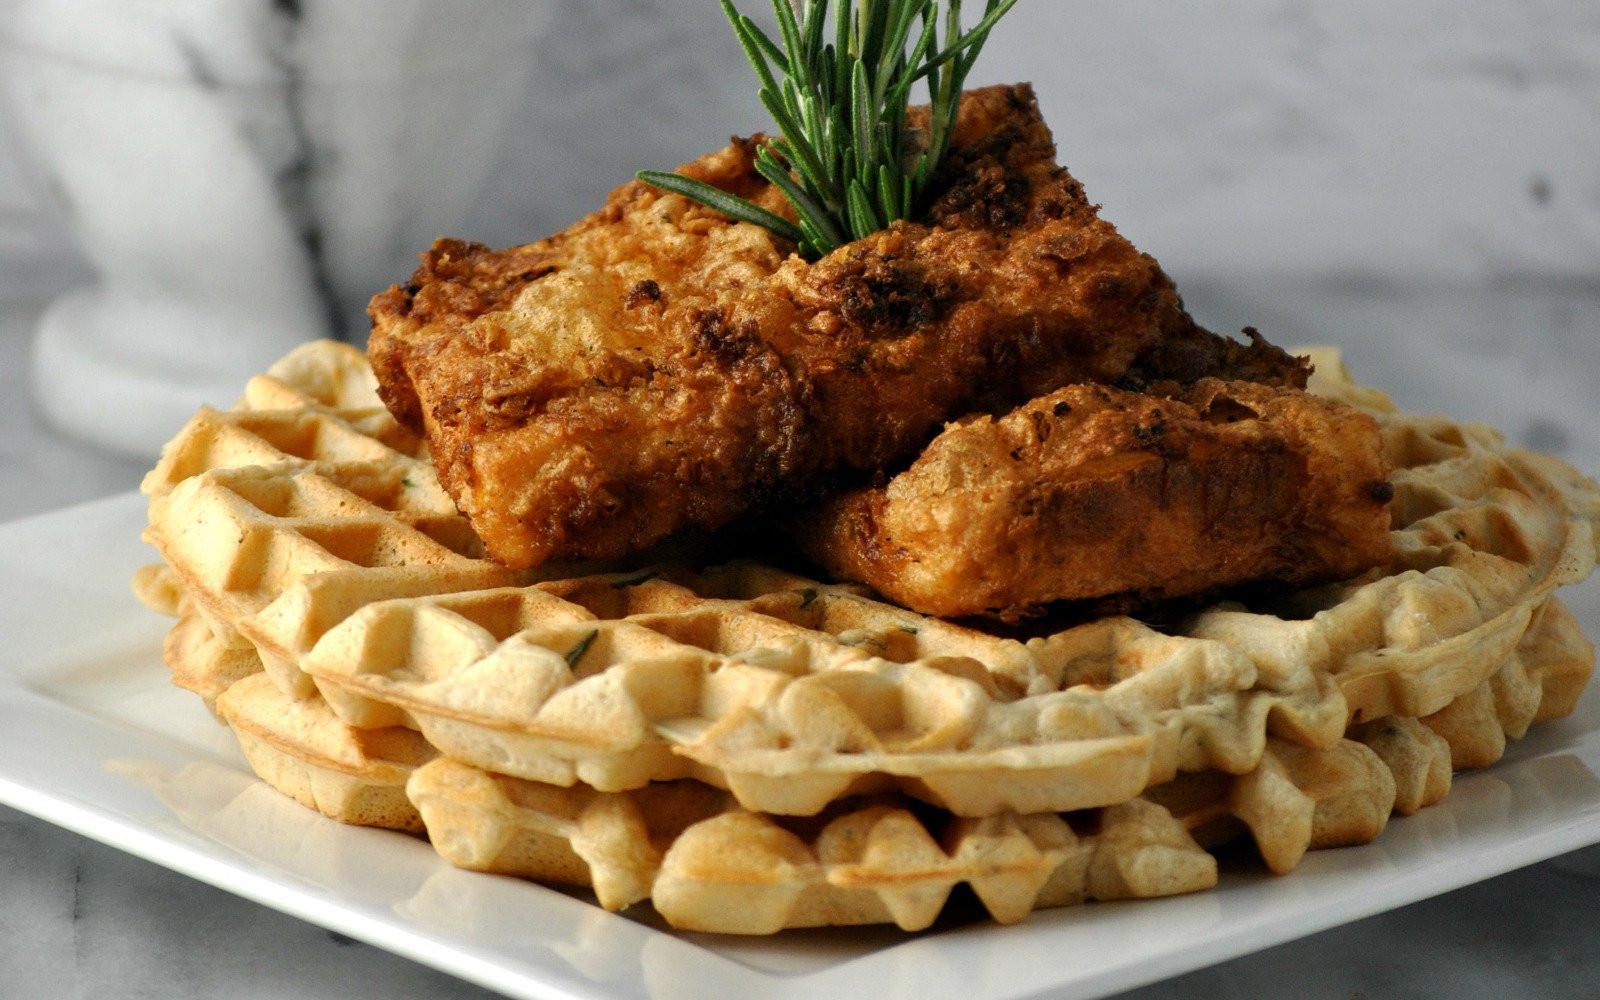 Kfc Chicken And Waffles  Chicken and Waffles [Vegan]